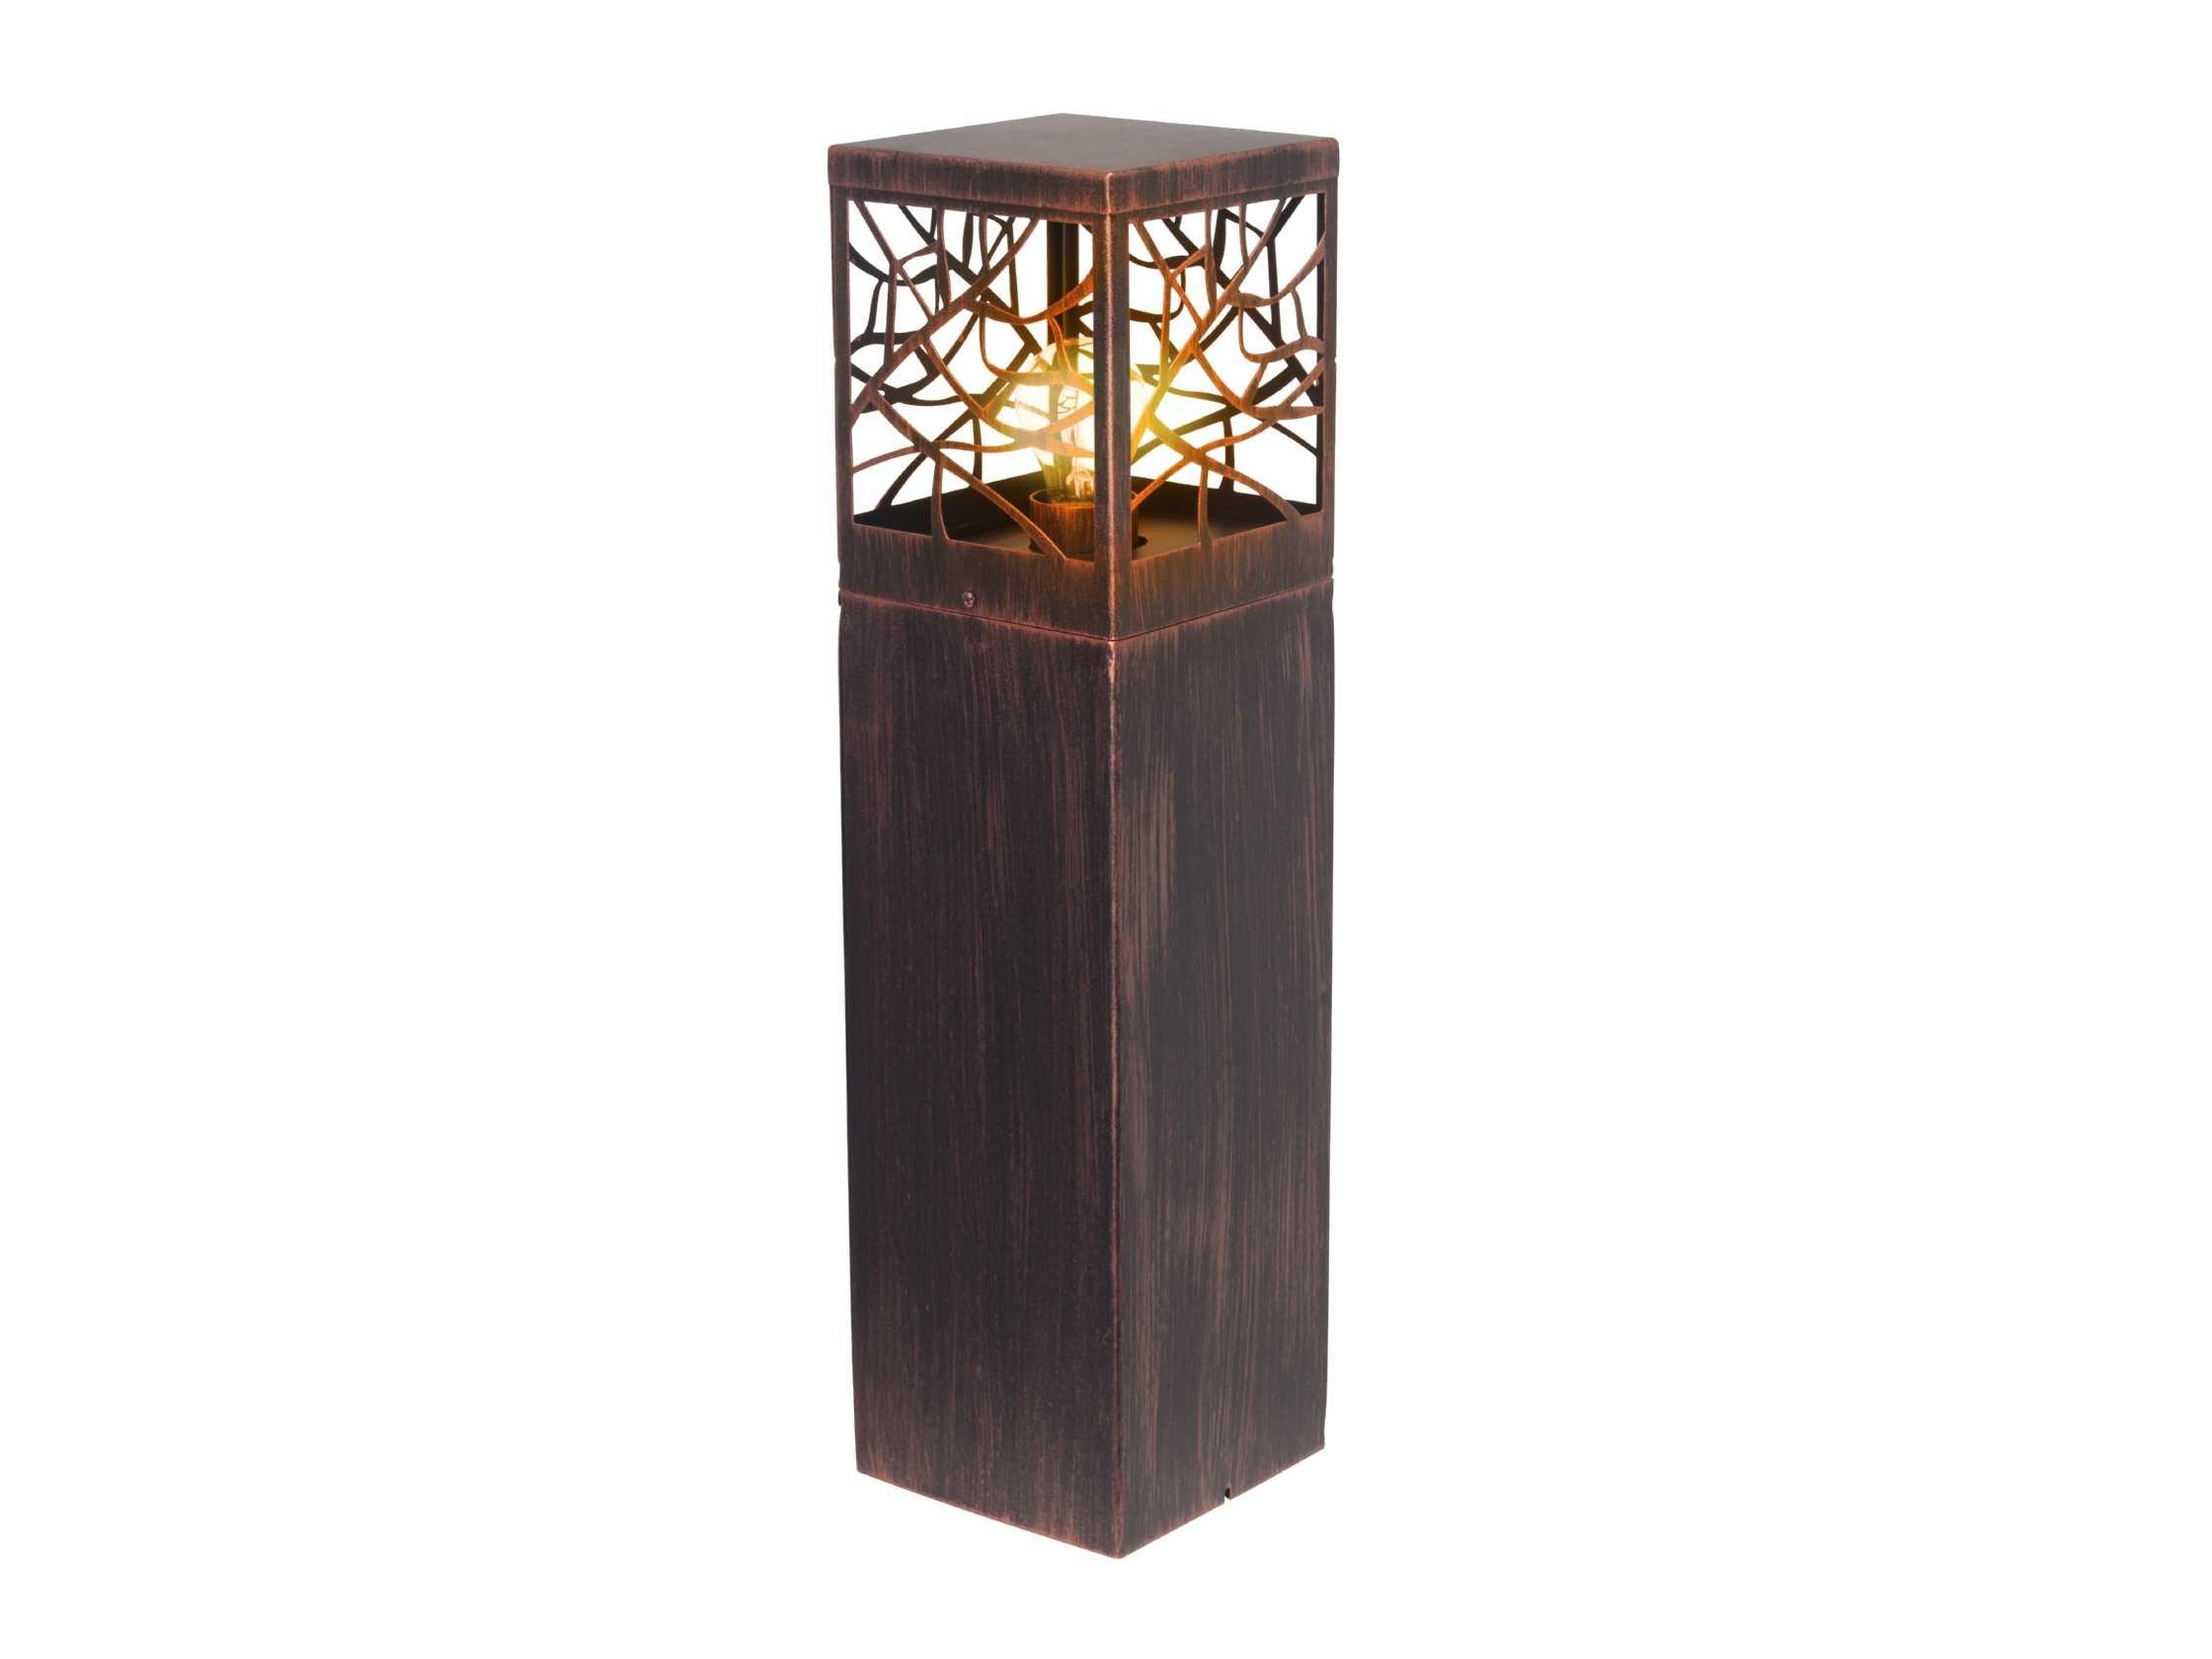 Светильник уличный WHITNEYУличные наземные светильники<br>&amp;lt;div&amp;gt;Вид цоколя: Е27&amp;lt;/div&amp;gt;&amp;lt;div&amp;gt;Мощность лампы: 60W&amp;lt;/div&amp;gt;&amp;lt;div&amp;gt;Количество ламп: 1&amp;lt;/div&amp;gt;&amp;lt;div&amp;gt;Наличие ламп: нет&amp;lt;/div&amp;gt;<br><br>Material: Металл<br>Width см: 15<br>Depth см: 15<br>Height см: 59